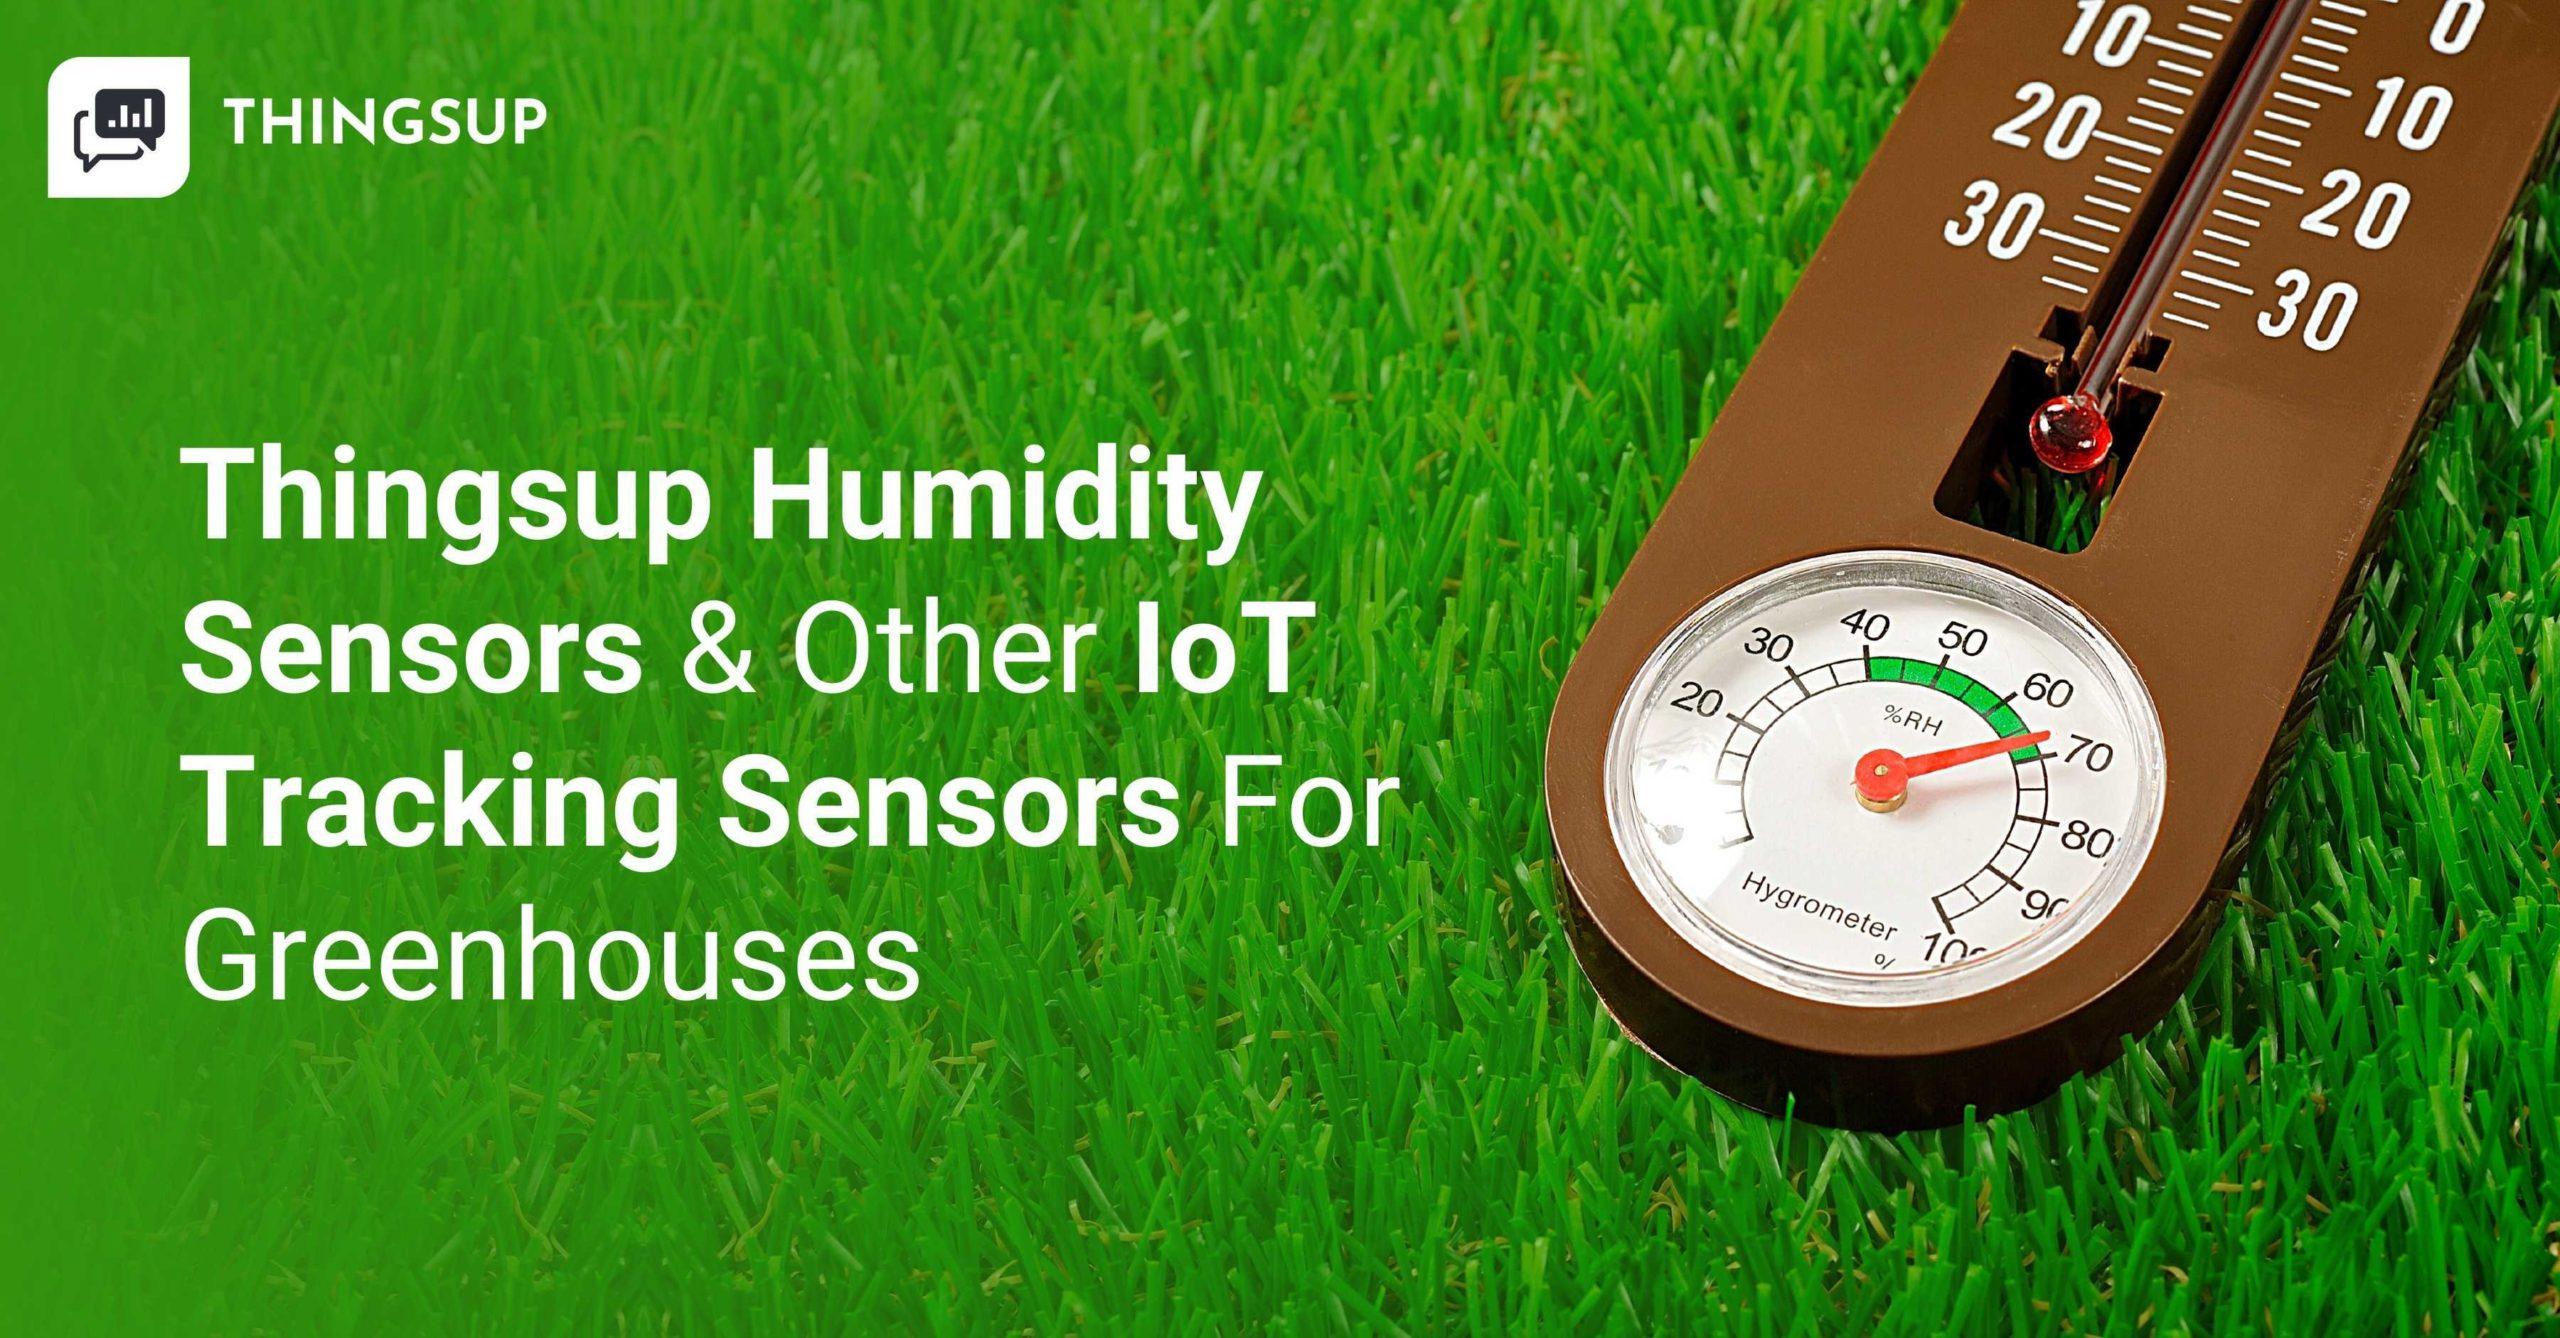 IOT Tracking Sensors